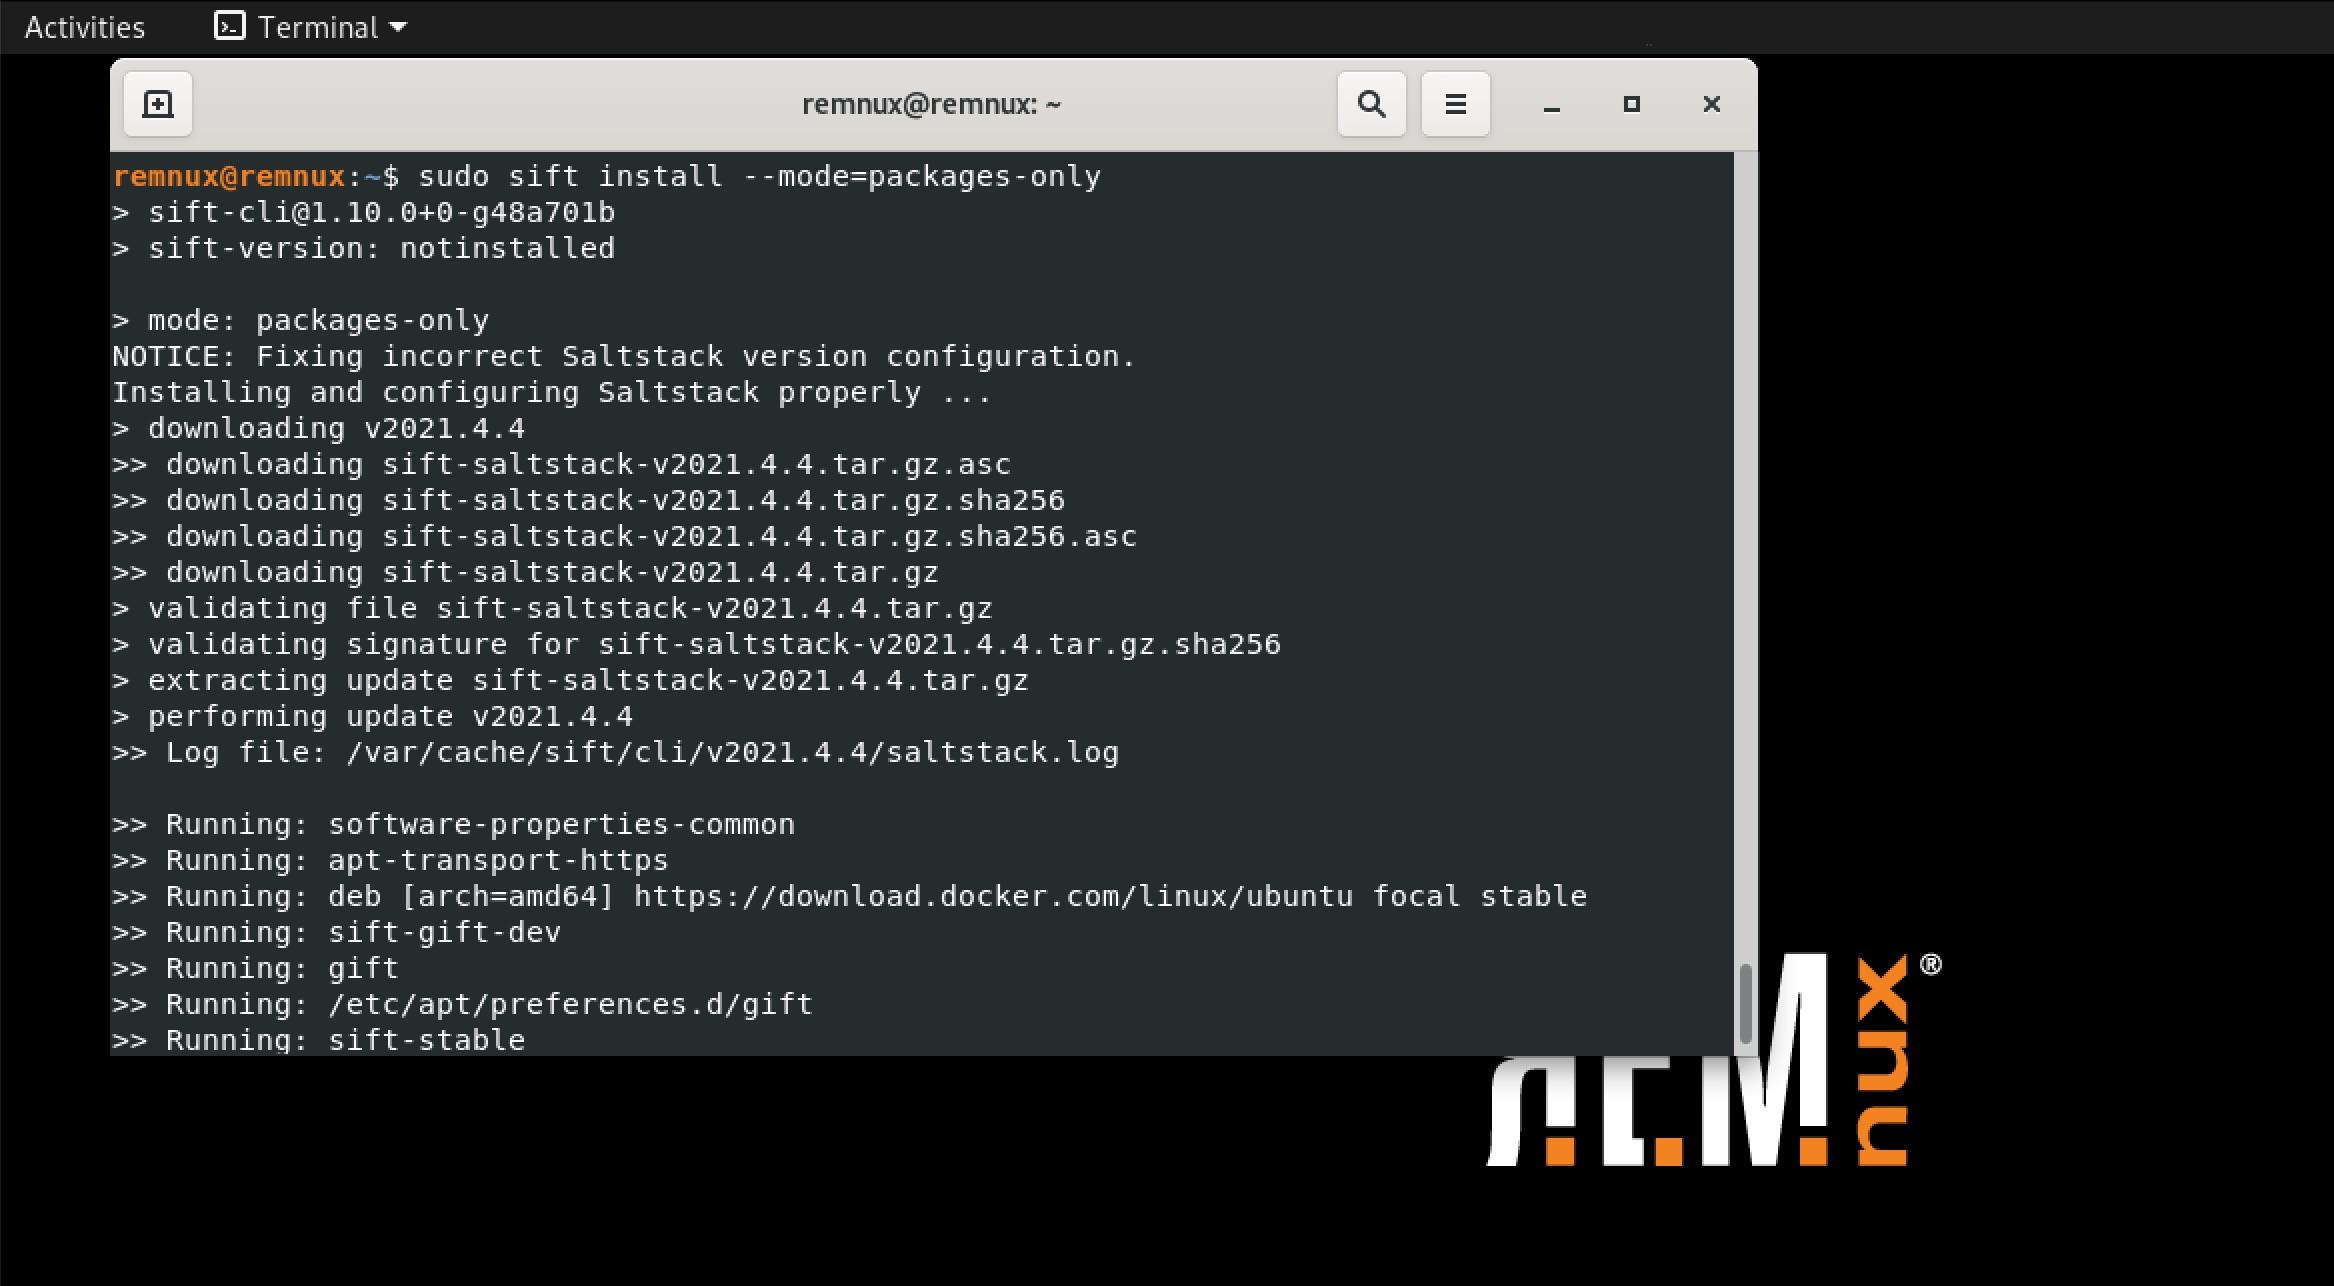 adding-sift-workstation-to-remnux.jpg